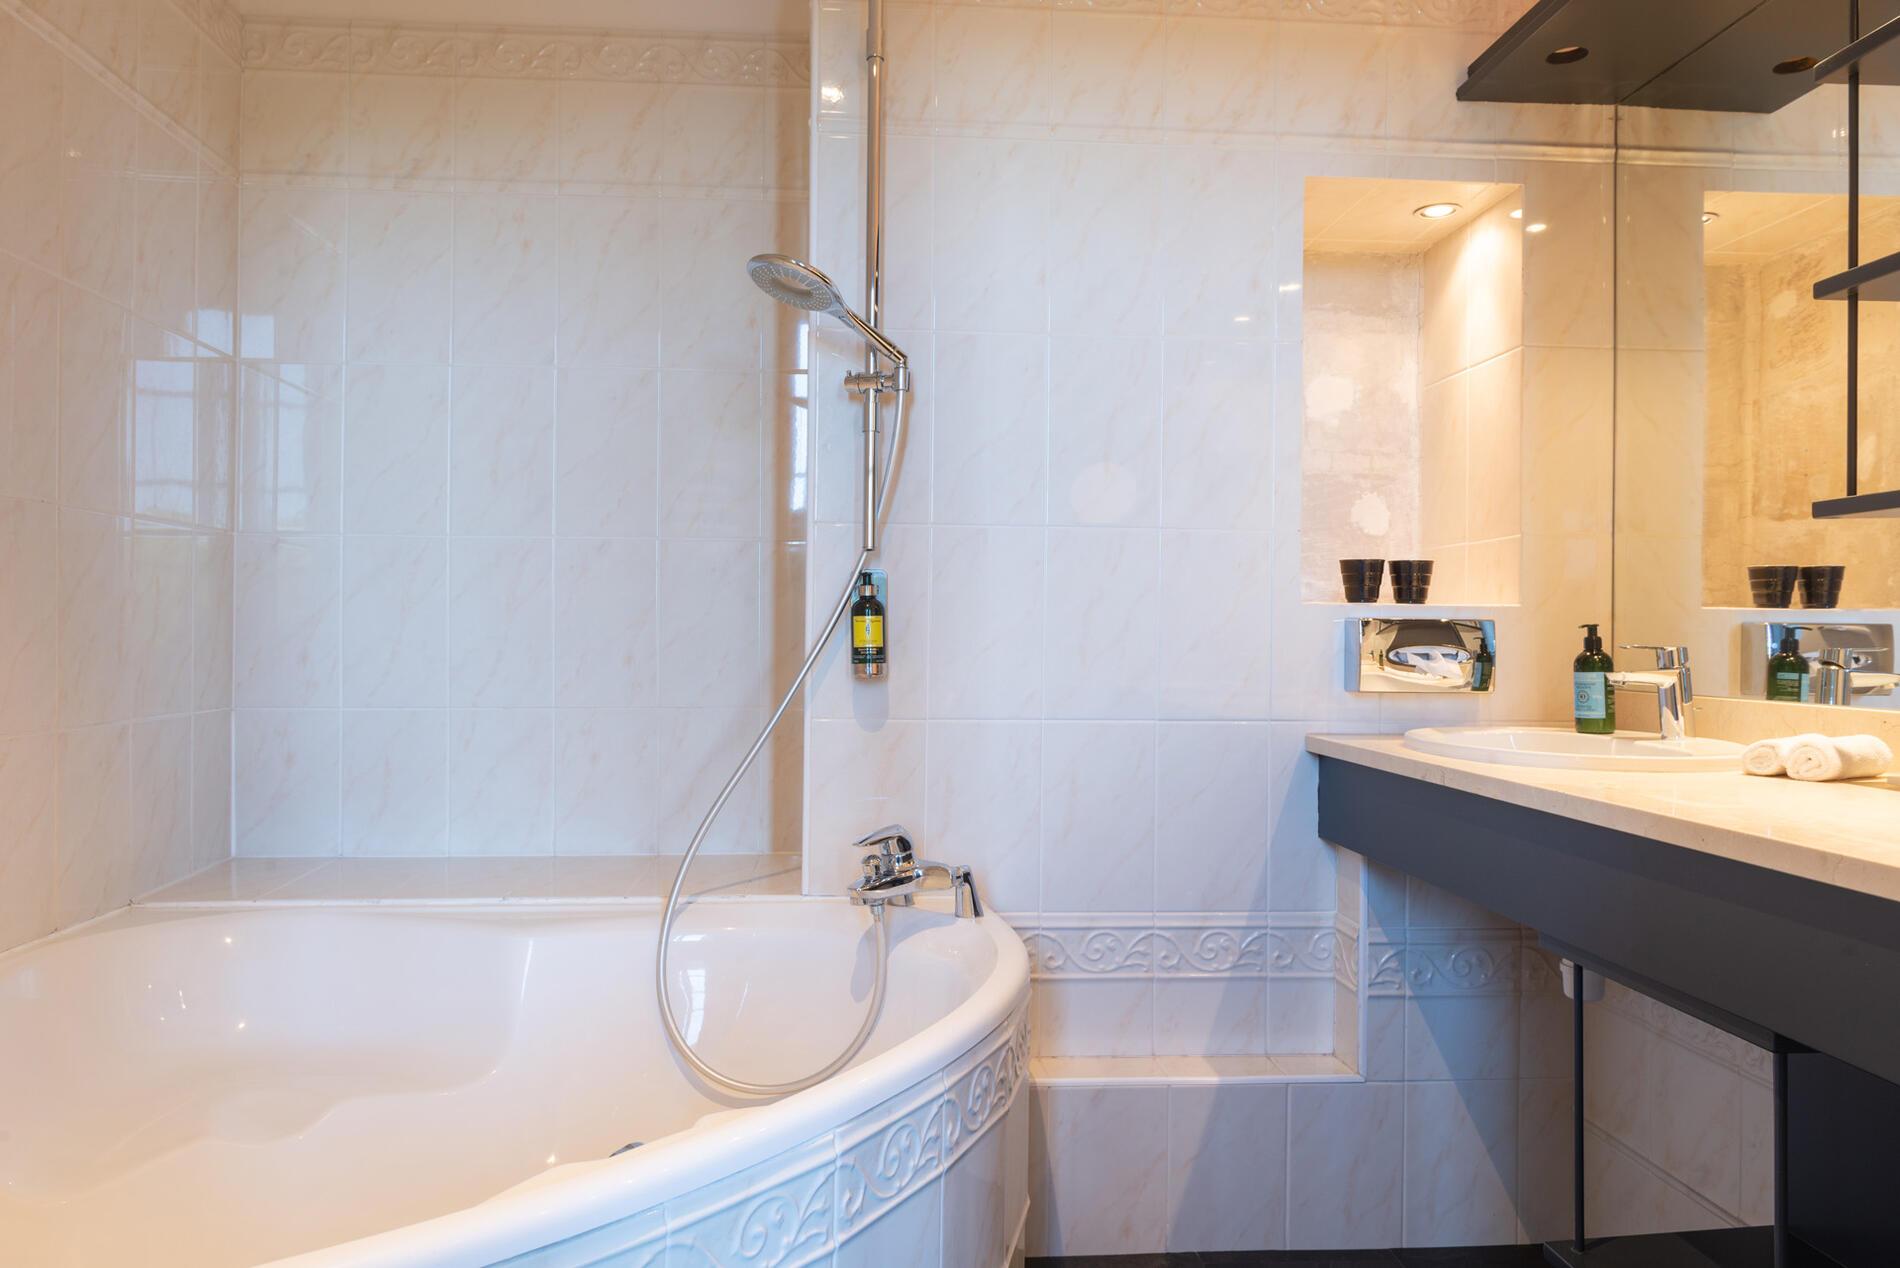 Bathroom at Hotel Anne d'Anjou in Saumur, France